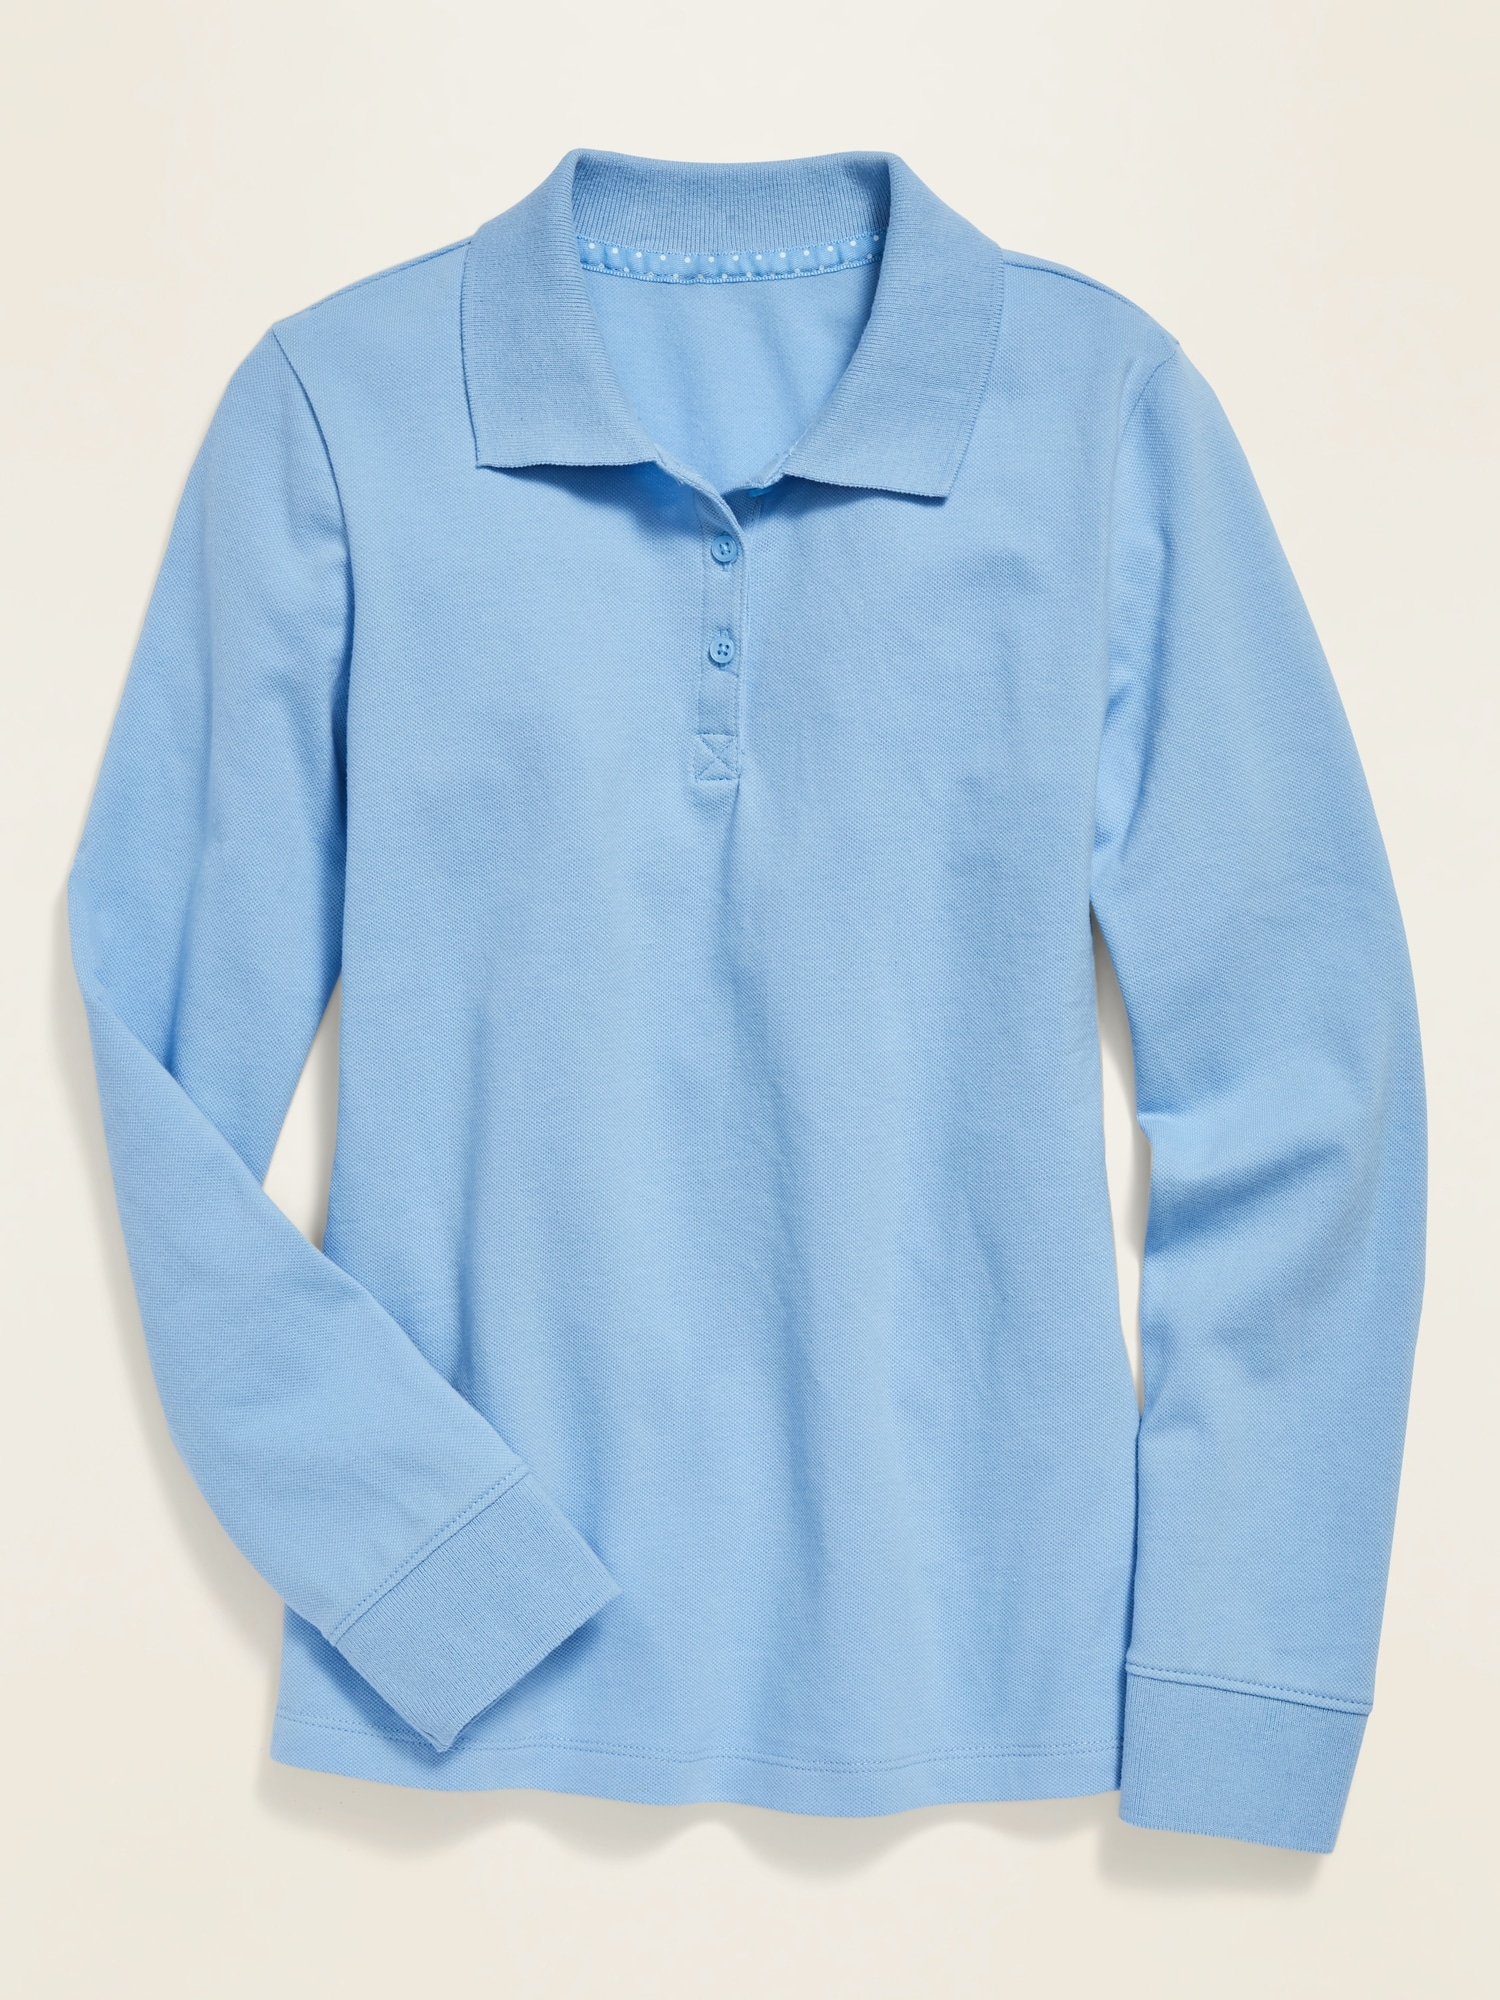 *Best Seller* Uniform Long-Sleeve Pique Polo for Girls